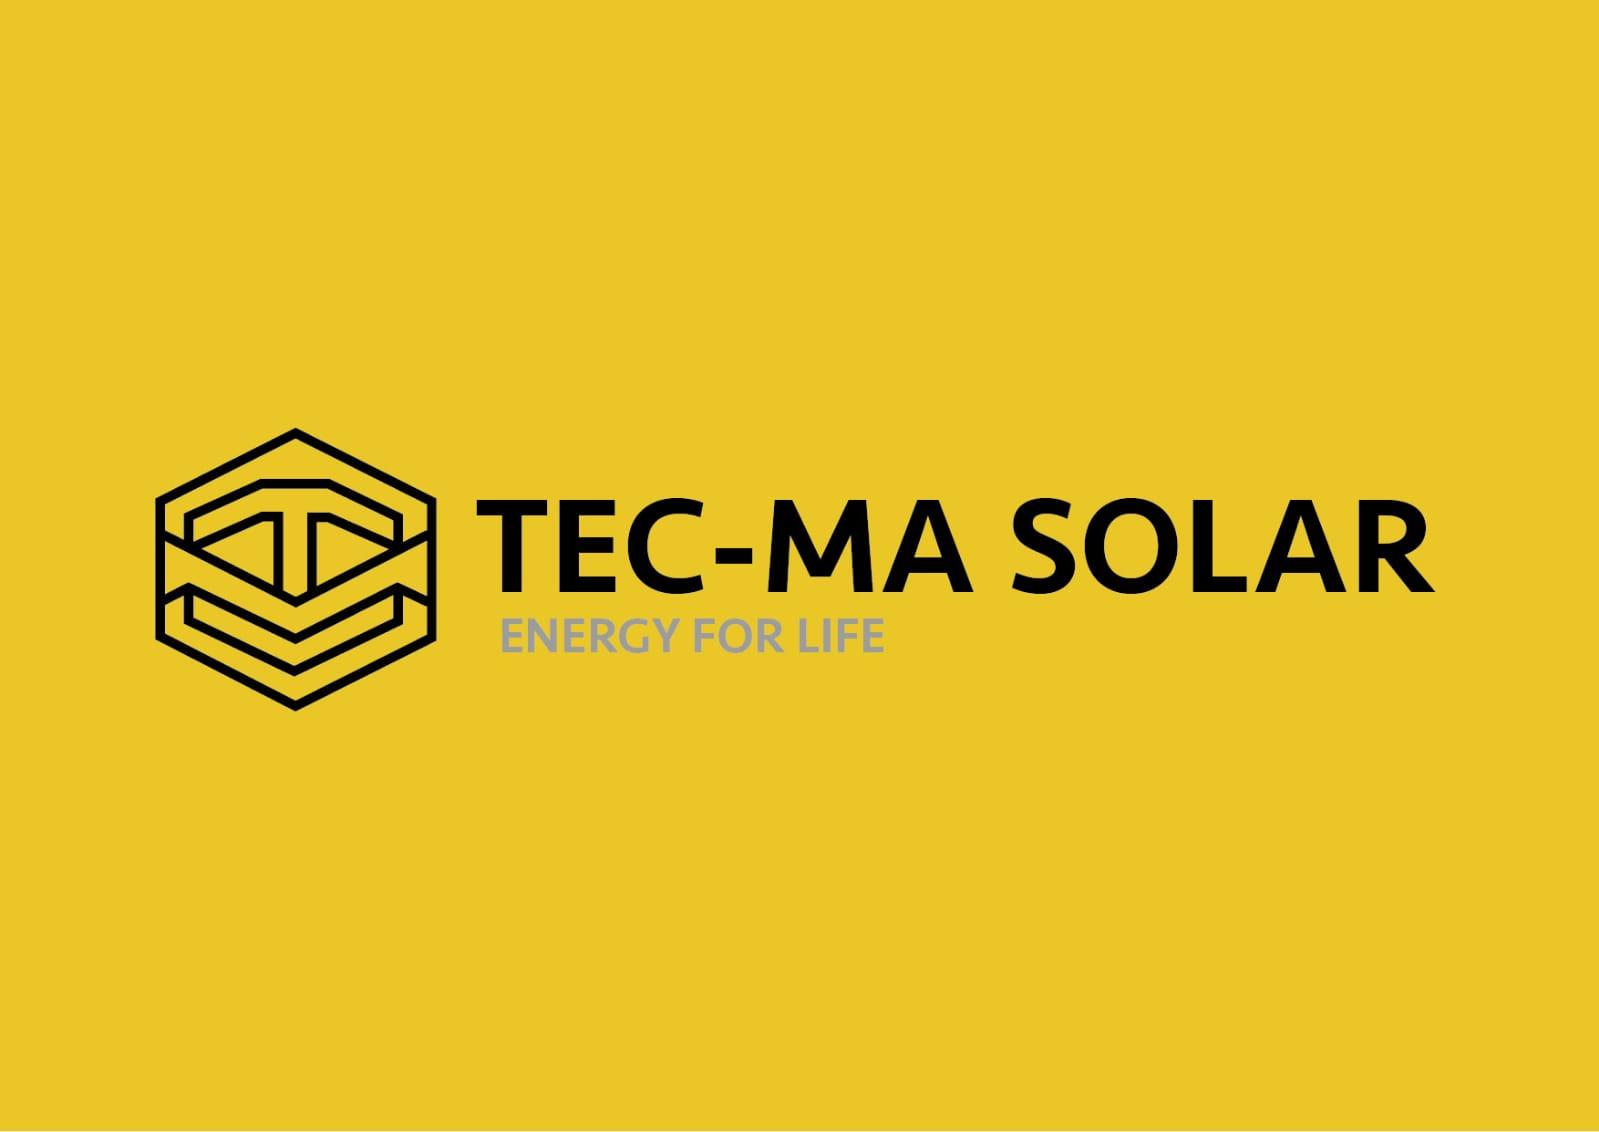 TEC-MA SOLAR SL